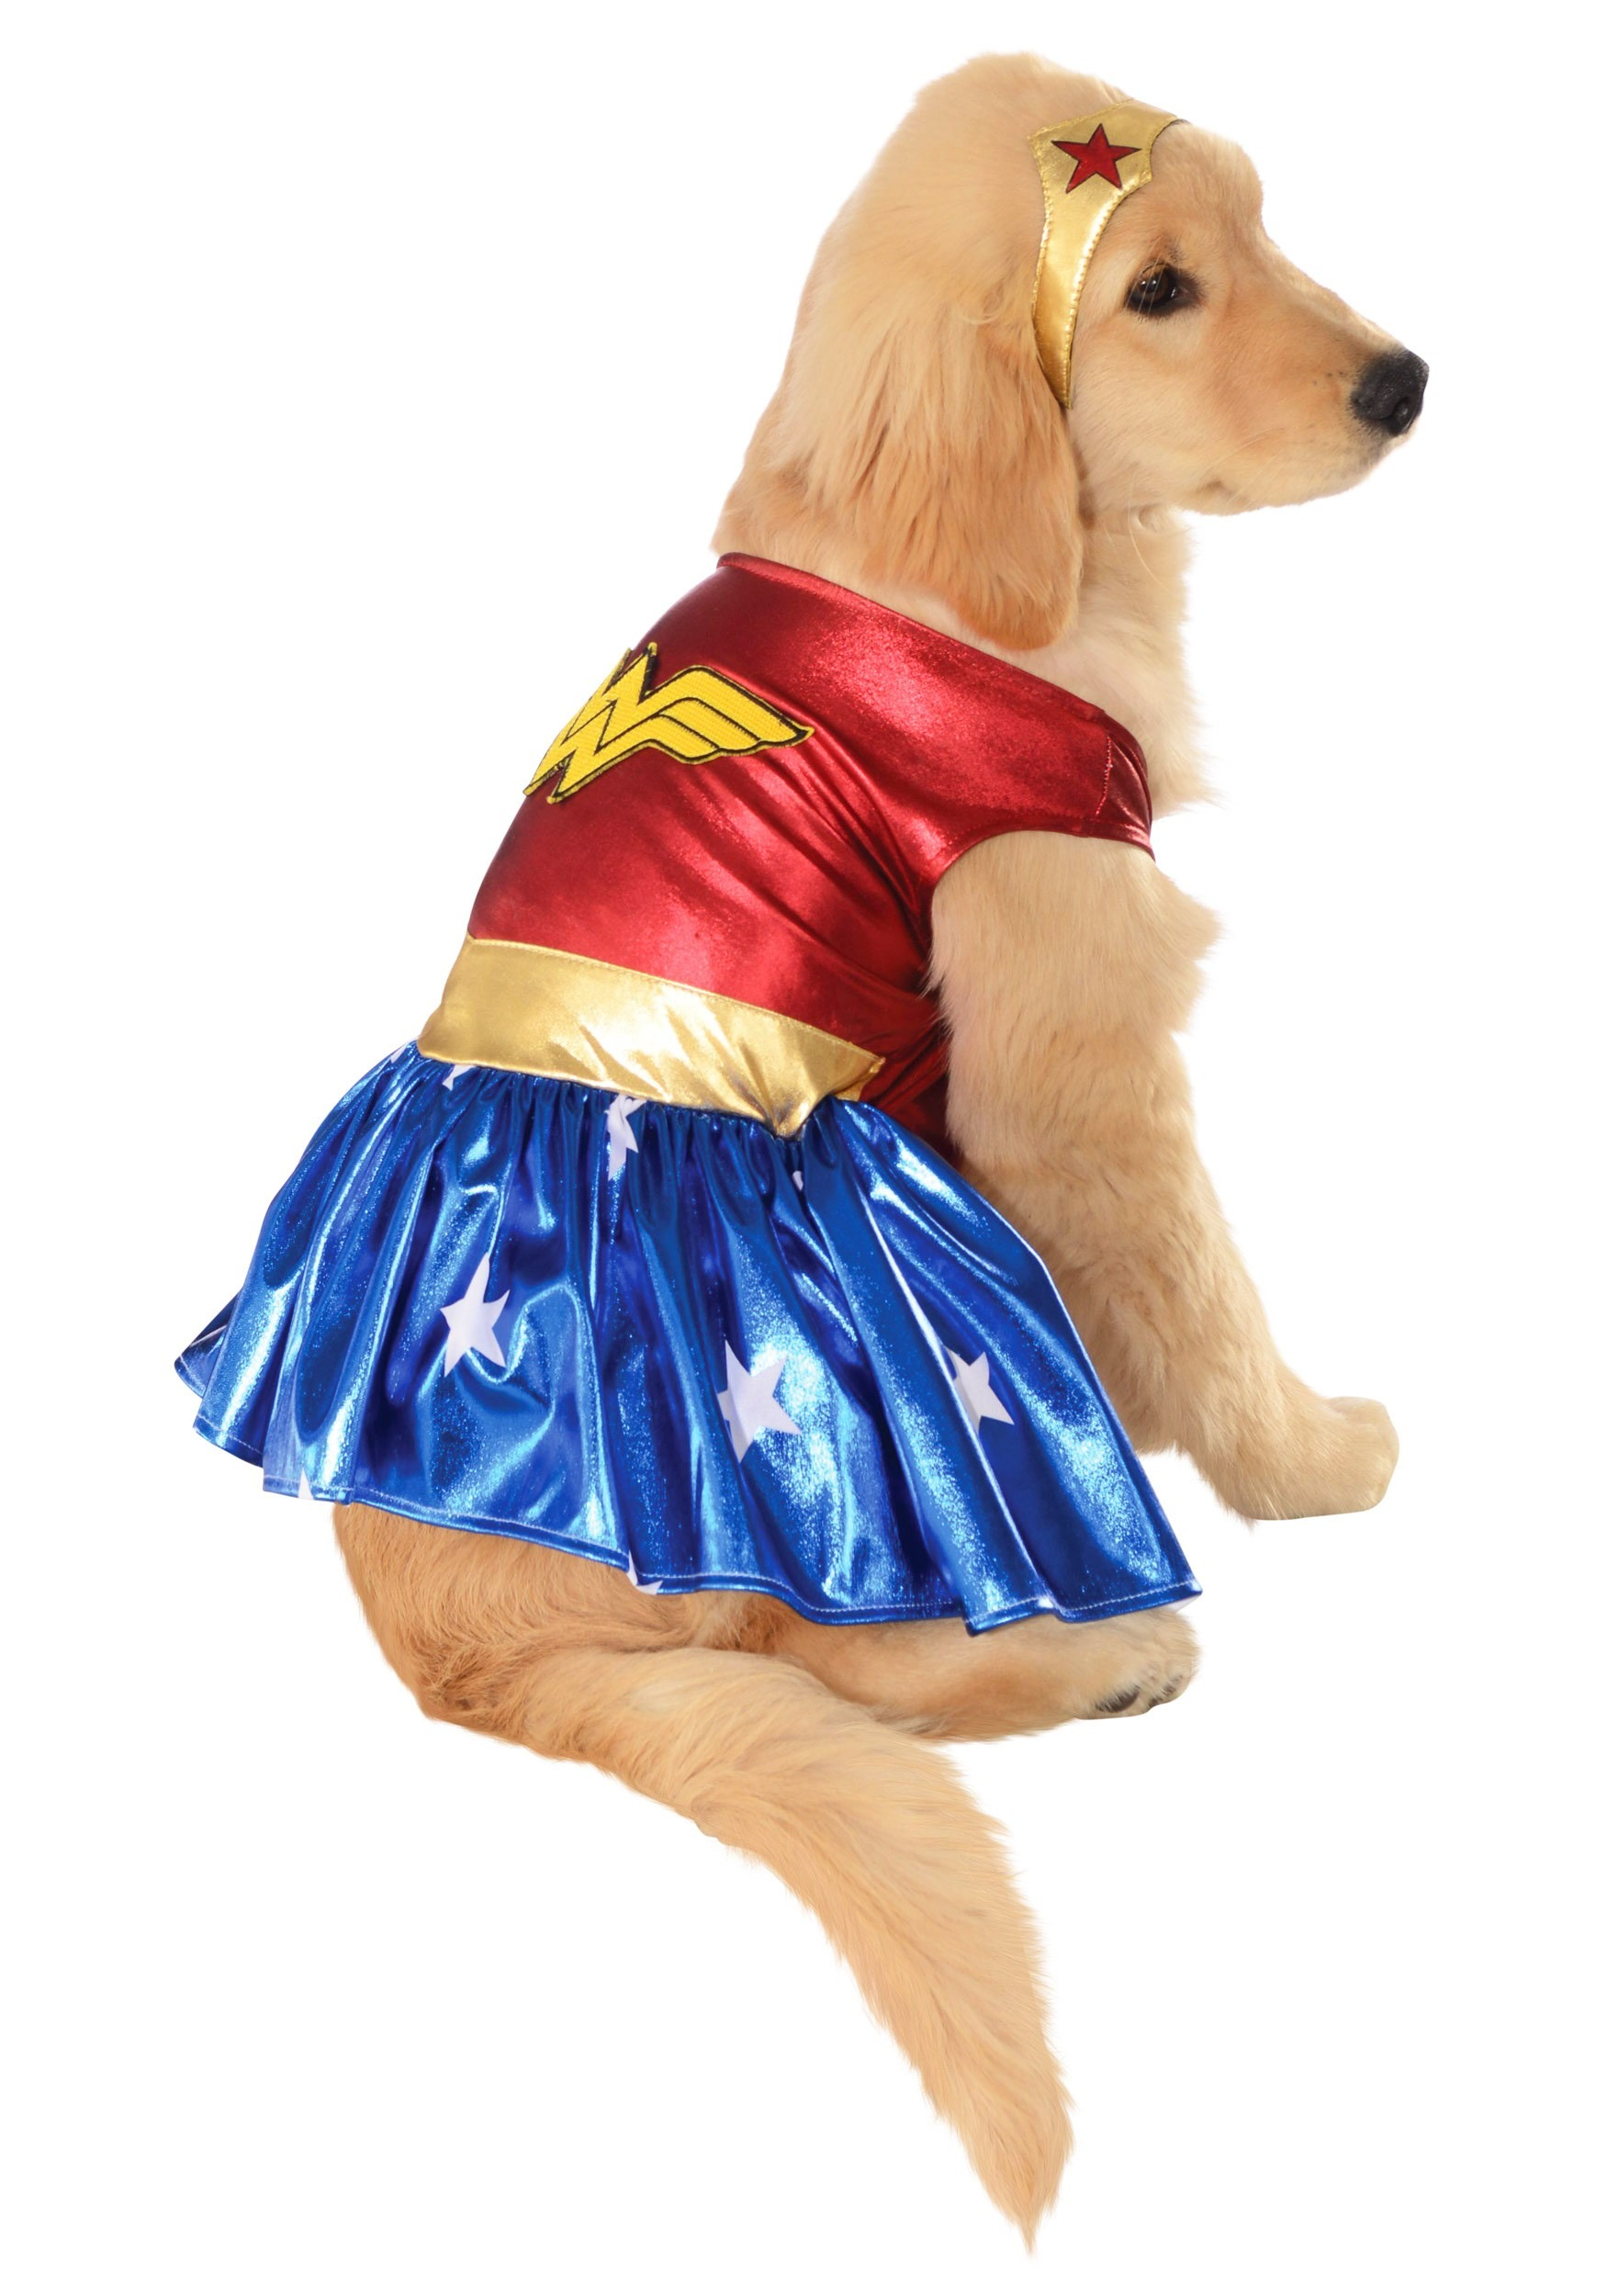 3fbca2fee2 Pet Costumes - Cat   Dog Halloween Costumes - HalloweenCostumes.com ...